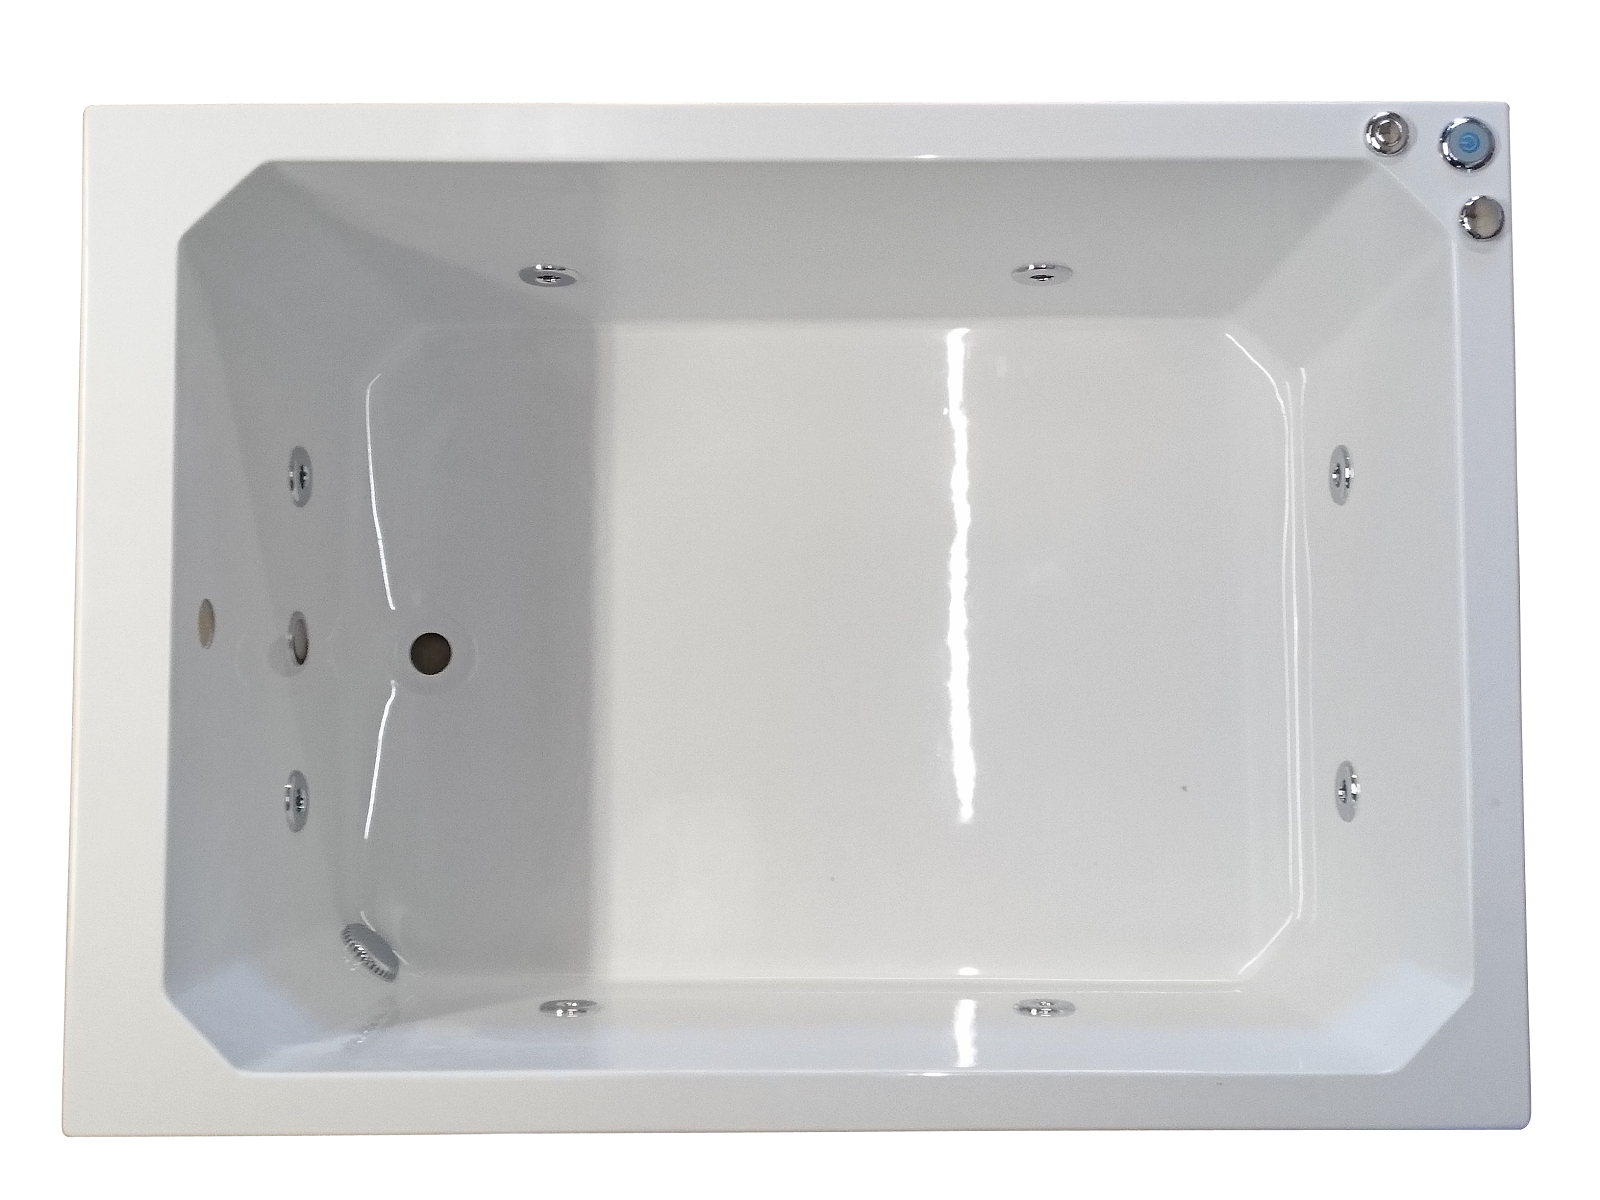 Oriental 1200 x 1000 mm 8 Jet Whirlpool Bath | Japanese Soaking Tubs ...